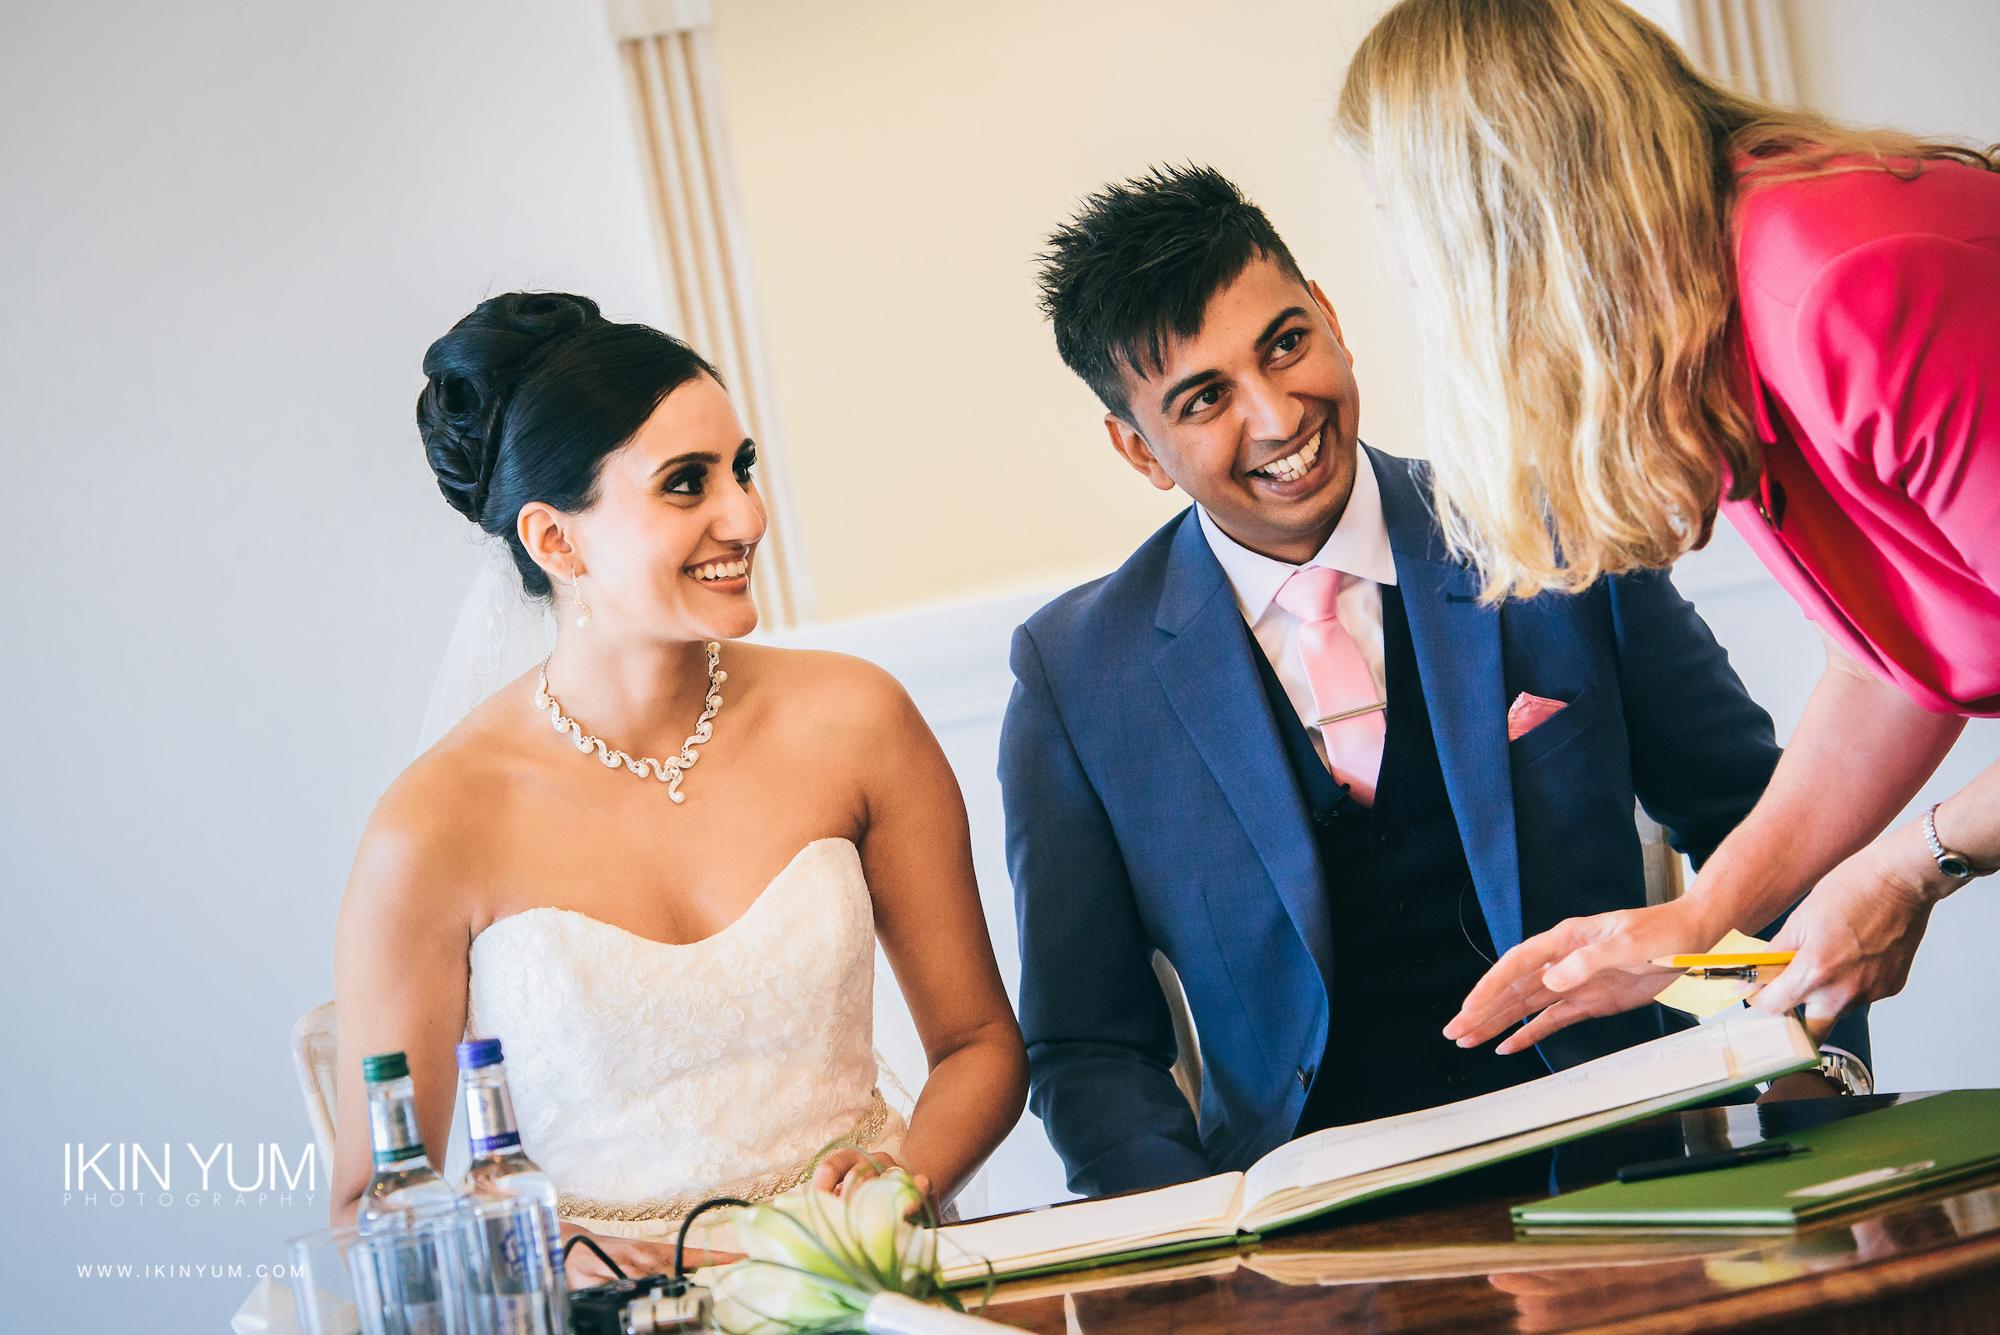 Froyle Park Indian Wedding - Ikin Yum Photography-061.jpg